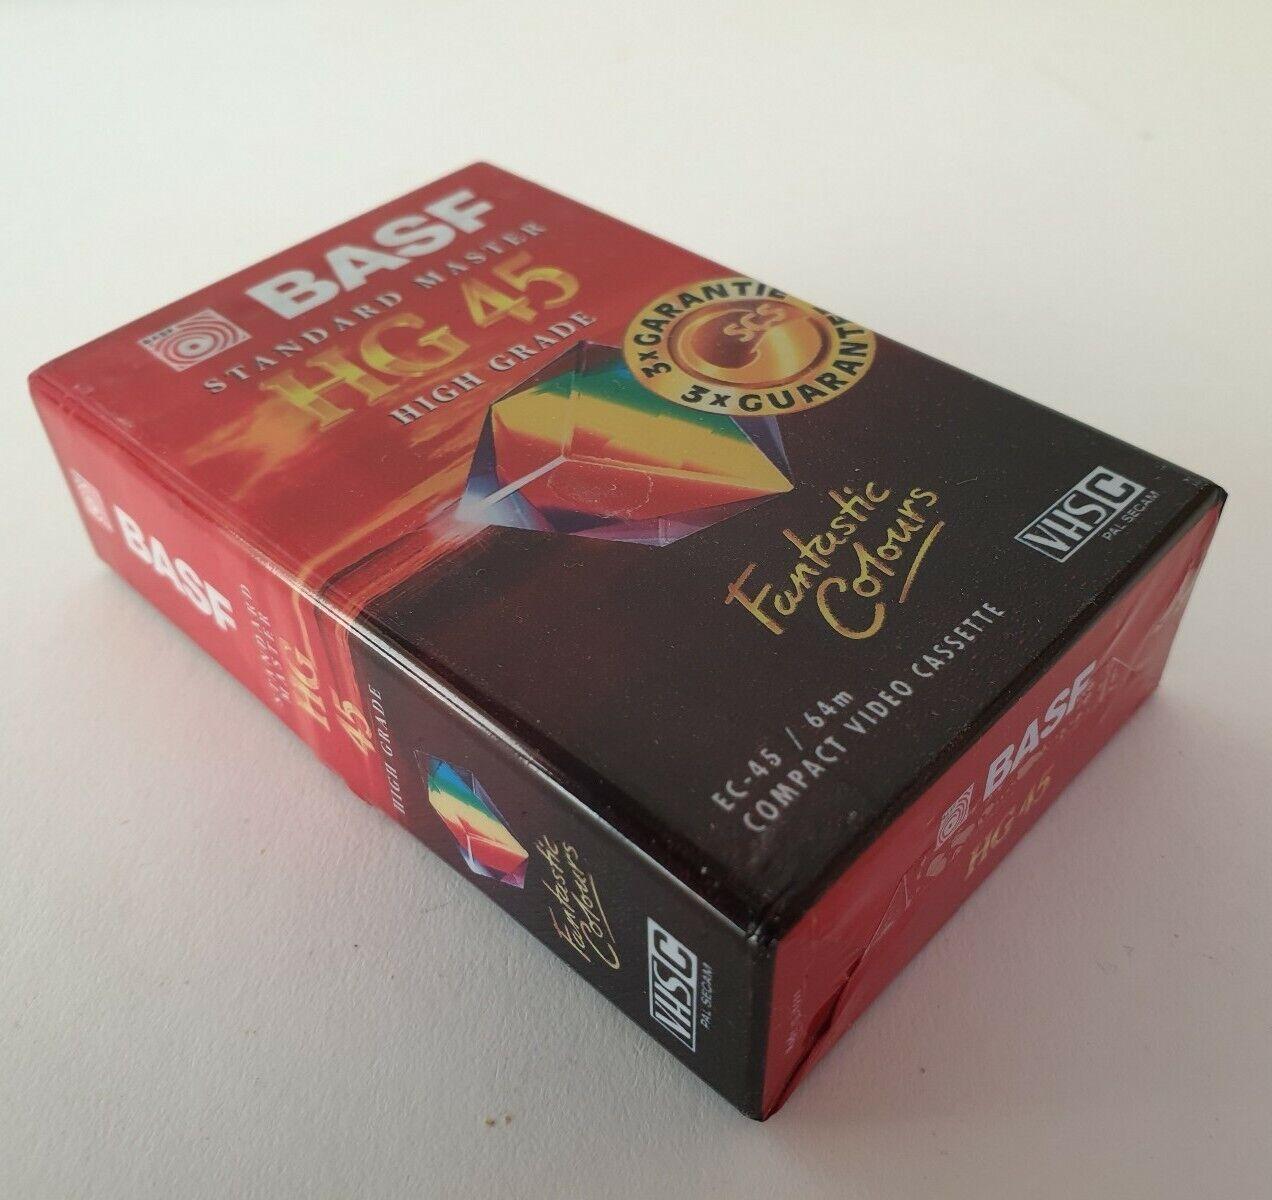 New BASF HG45 Standard Master High Grade Compact Video Cassette